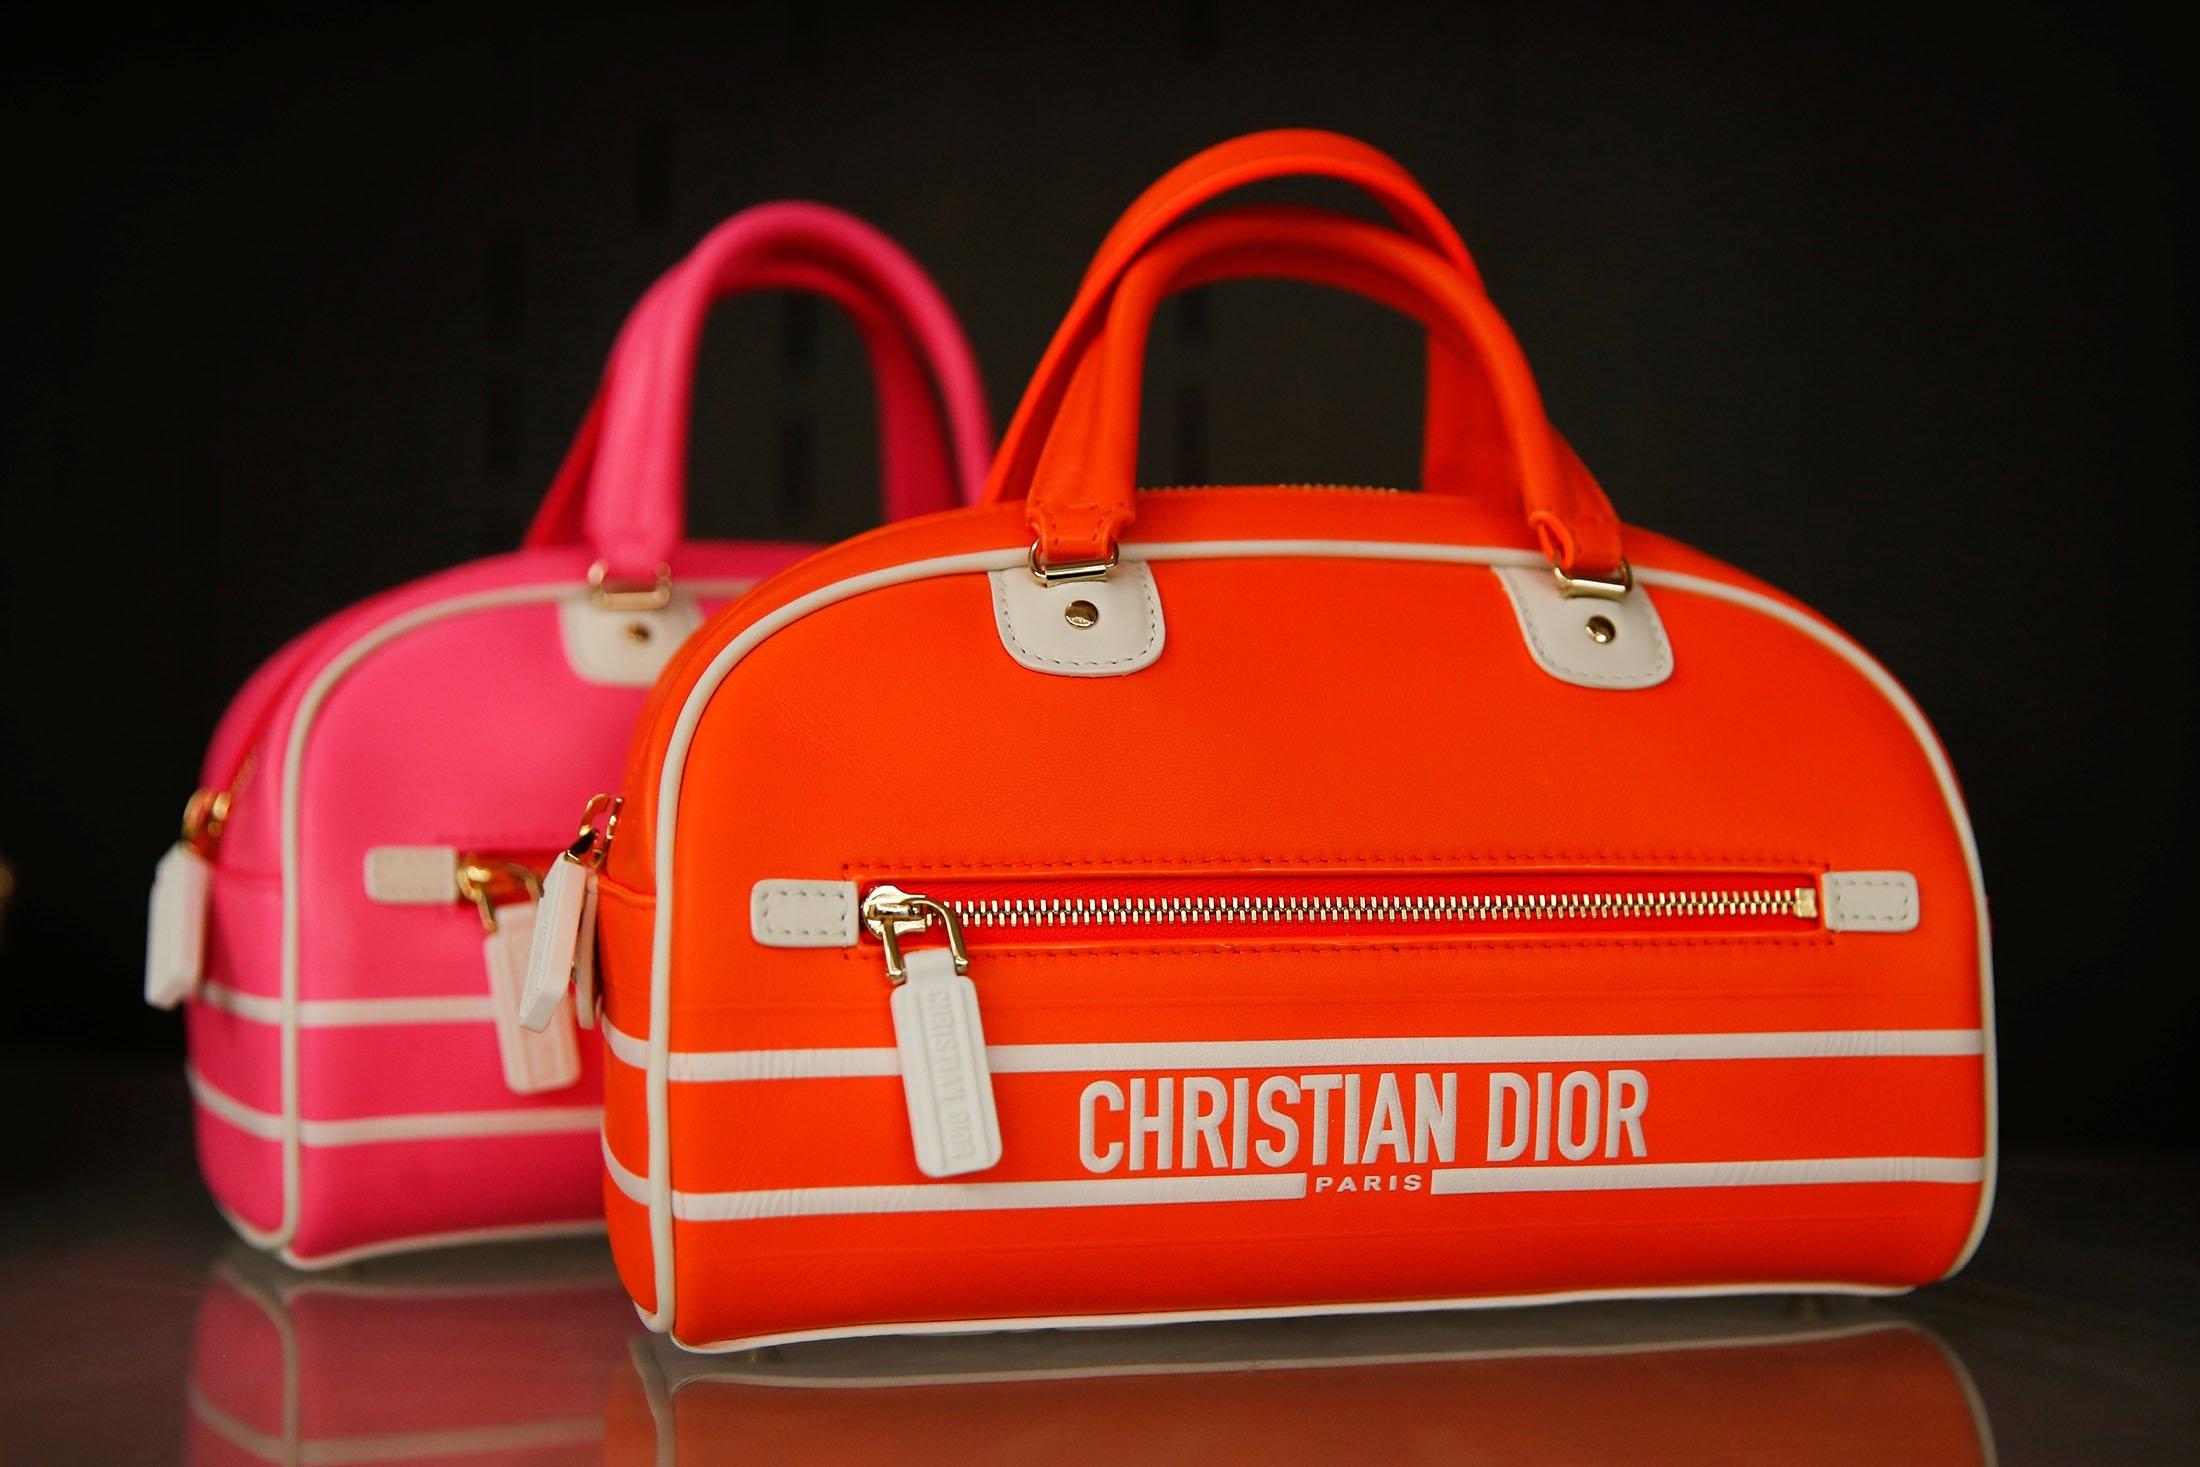 Handbag creations by designer Maria Grazia Chiuri are seen at the Dior workshop ahead of Paris Fashion Week in Paris, France, Sept. 26, 2021. (Reuters Photo)